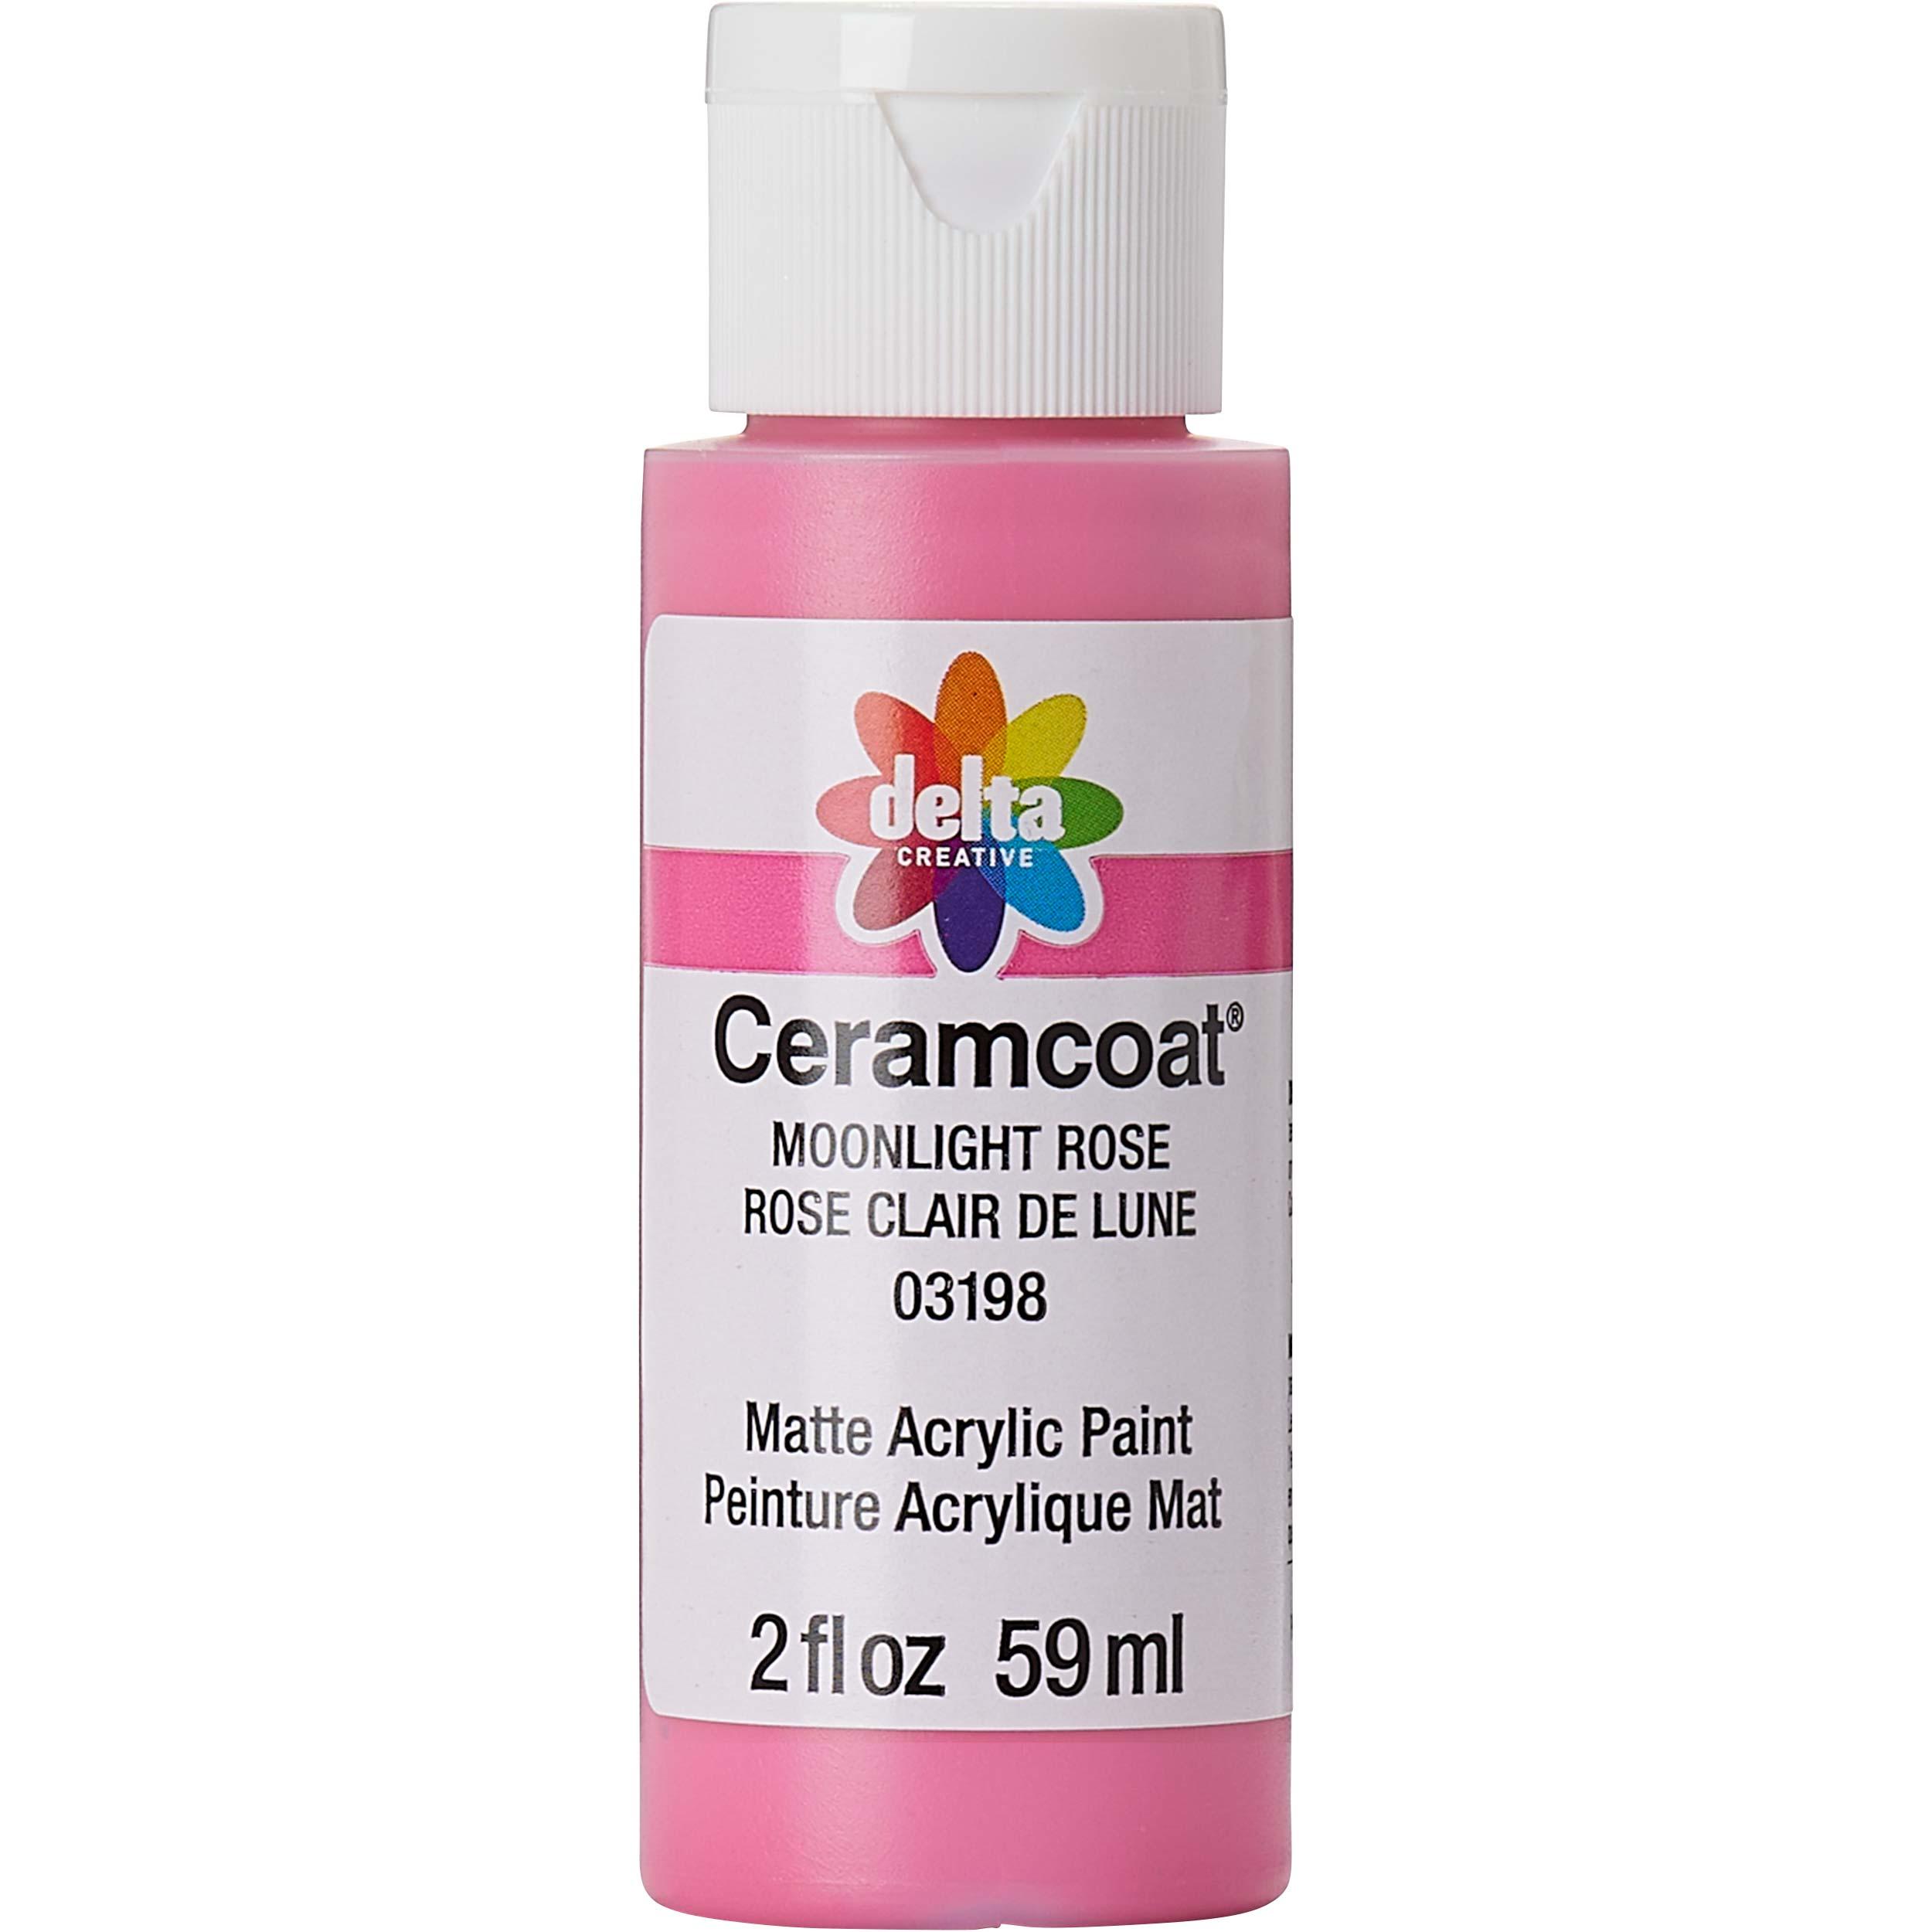 Delta Ceramcoat Acrylic Paint - Moonlight Rose, 2 oz. - 03198